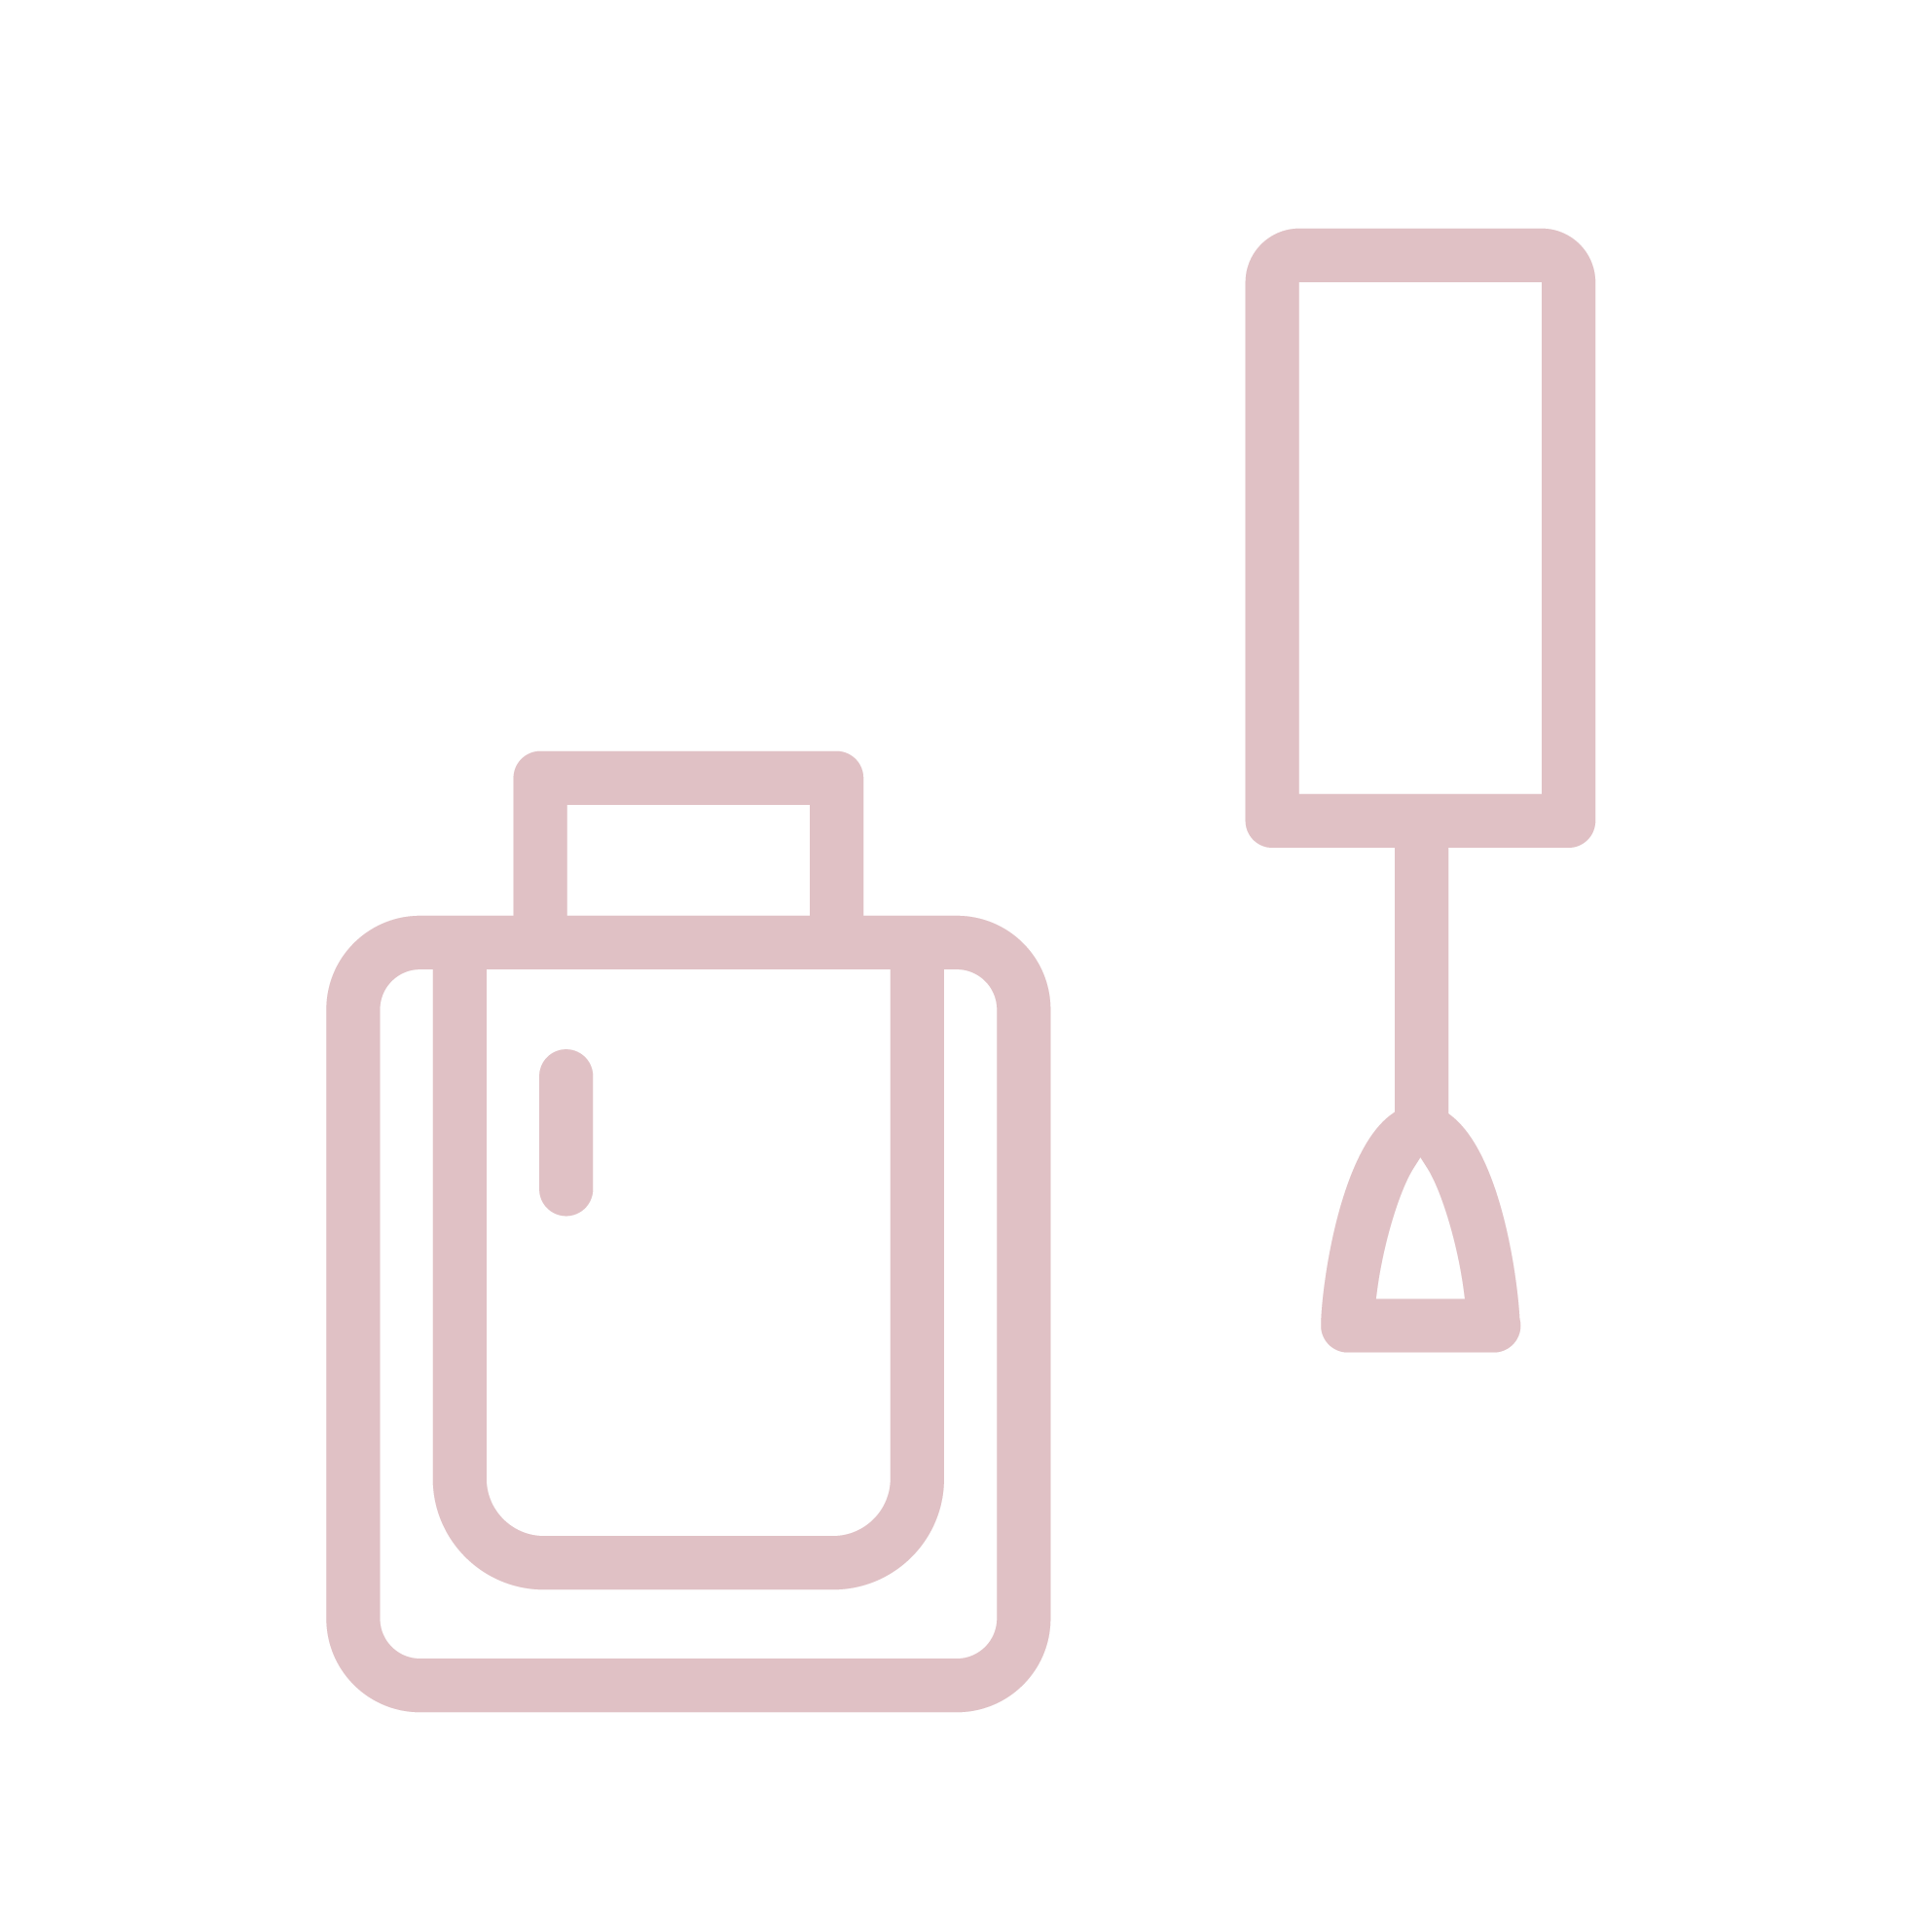 treatment-icons-05